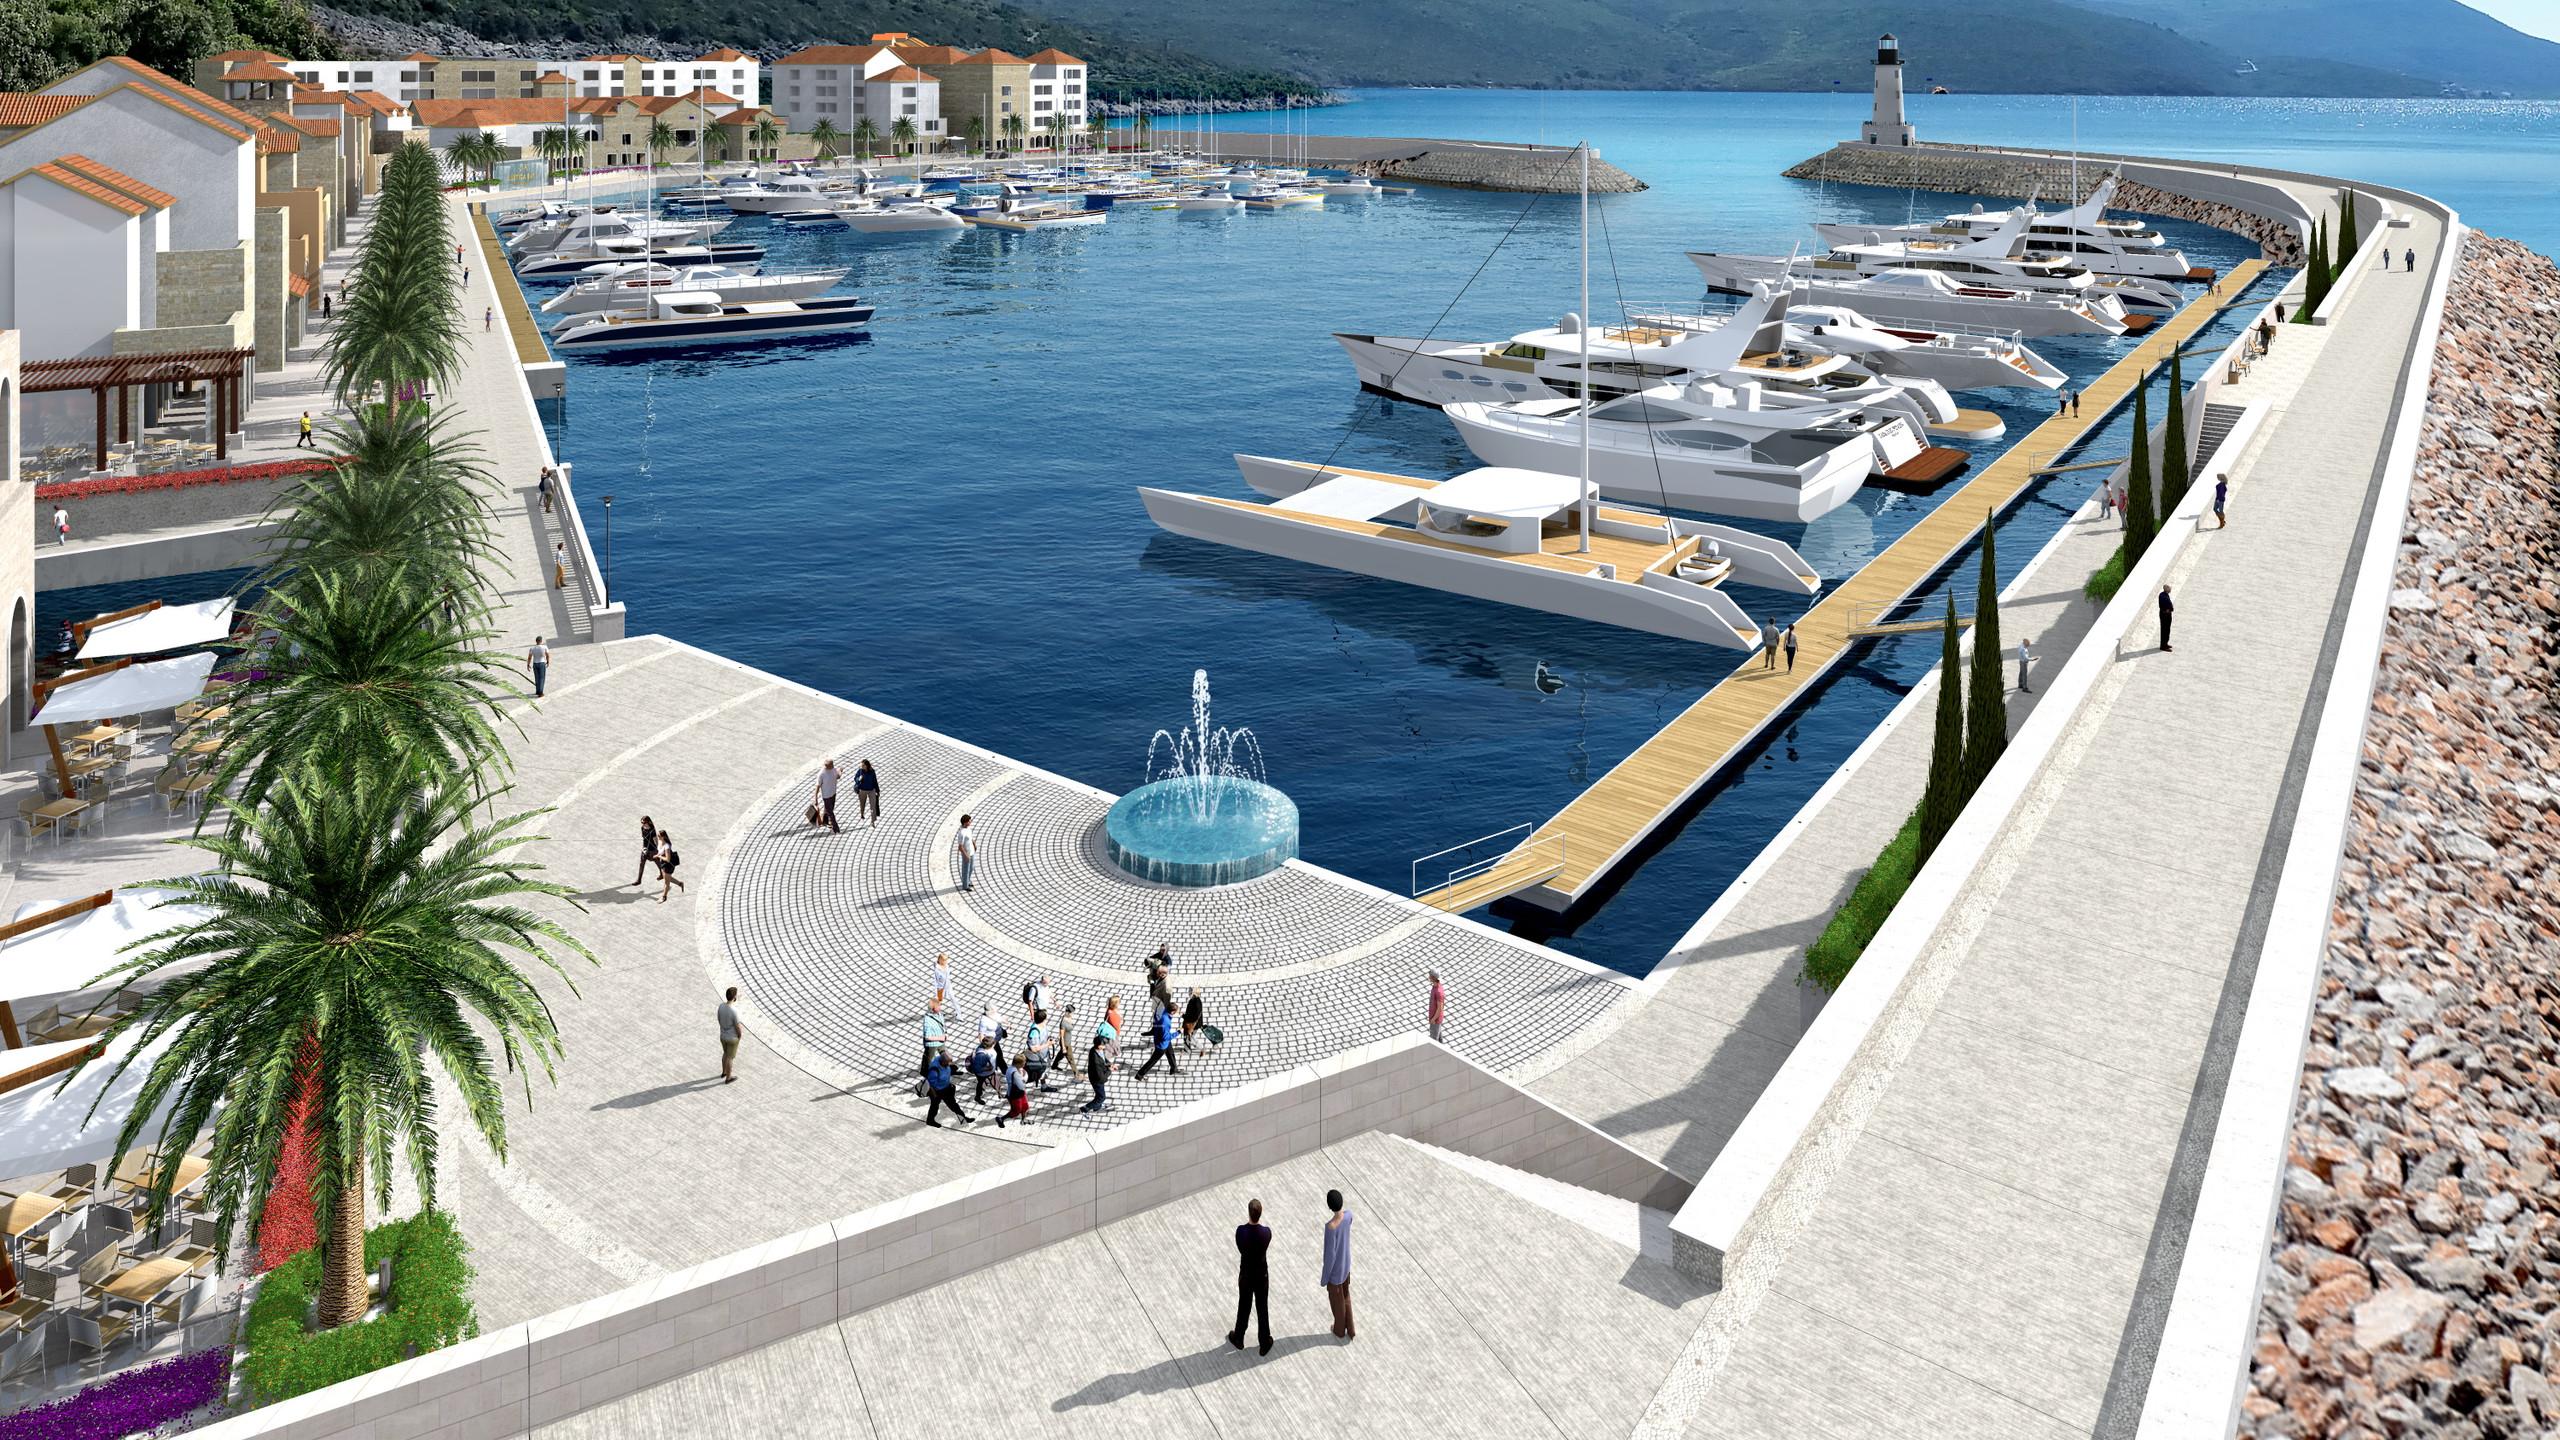 Lustica Bay 10